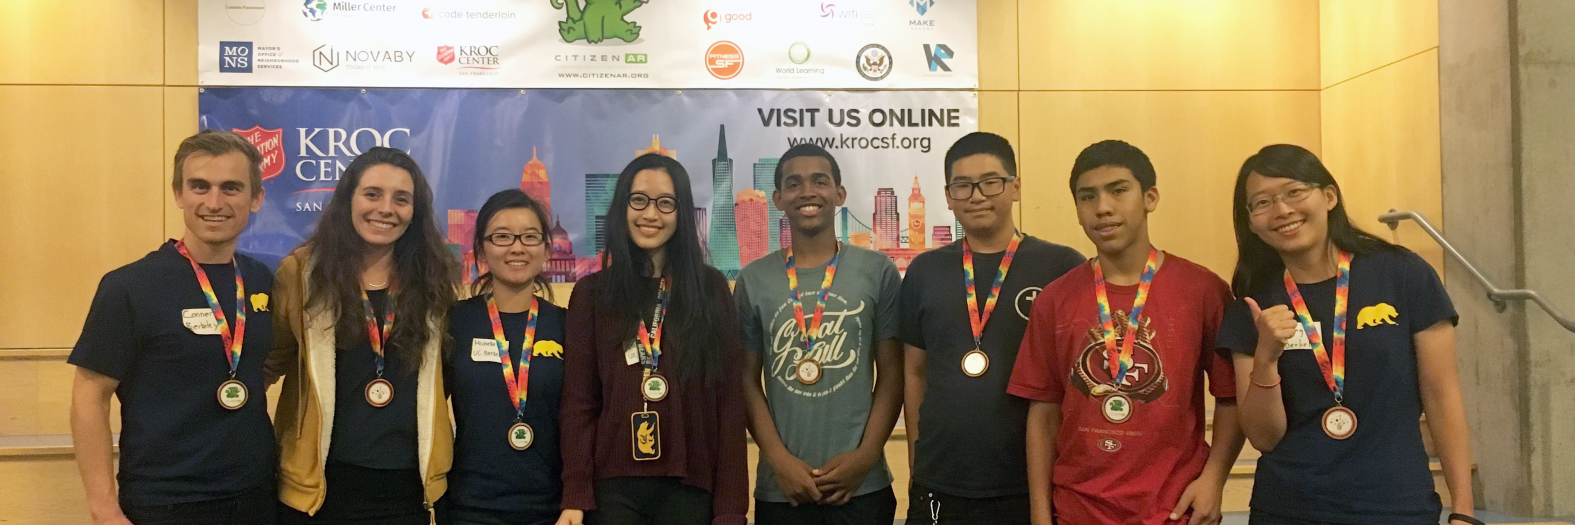 CitizenAR hackathon team